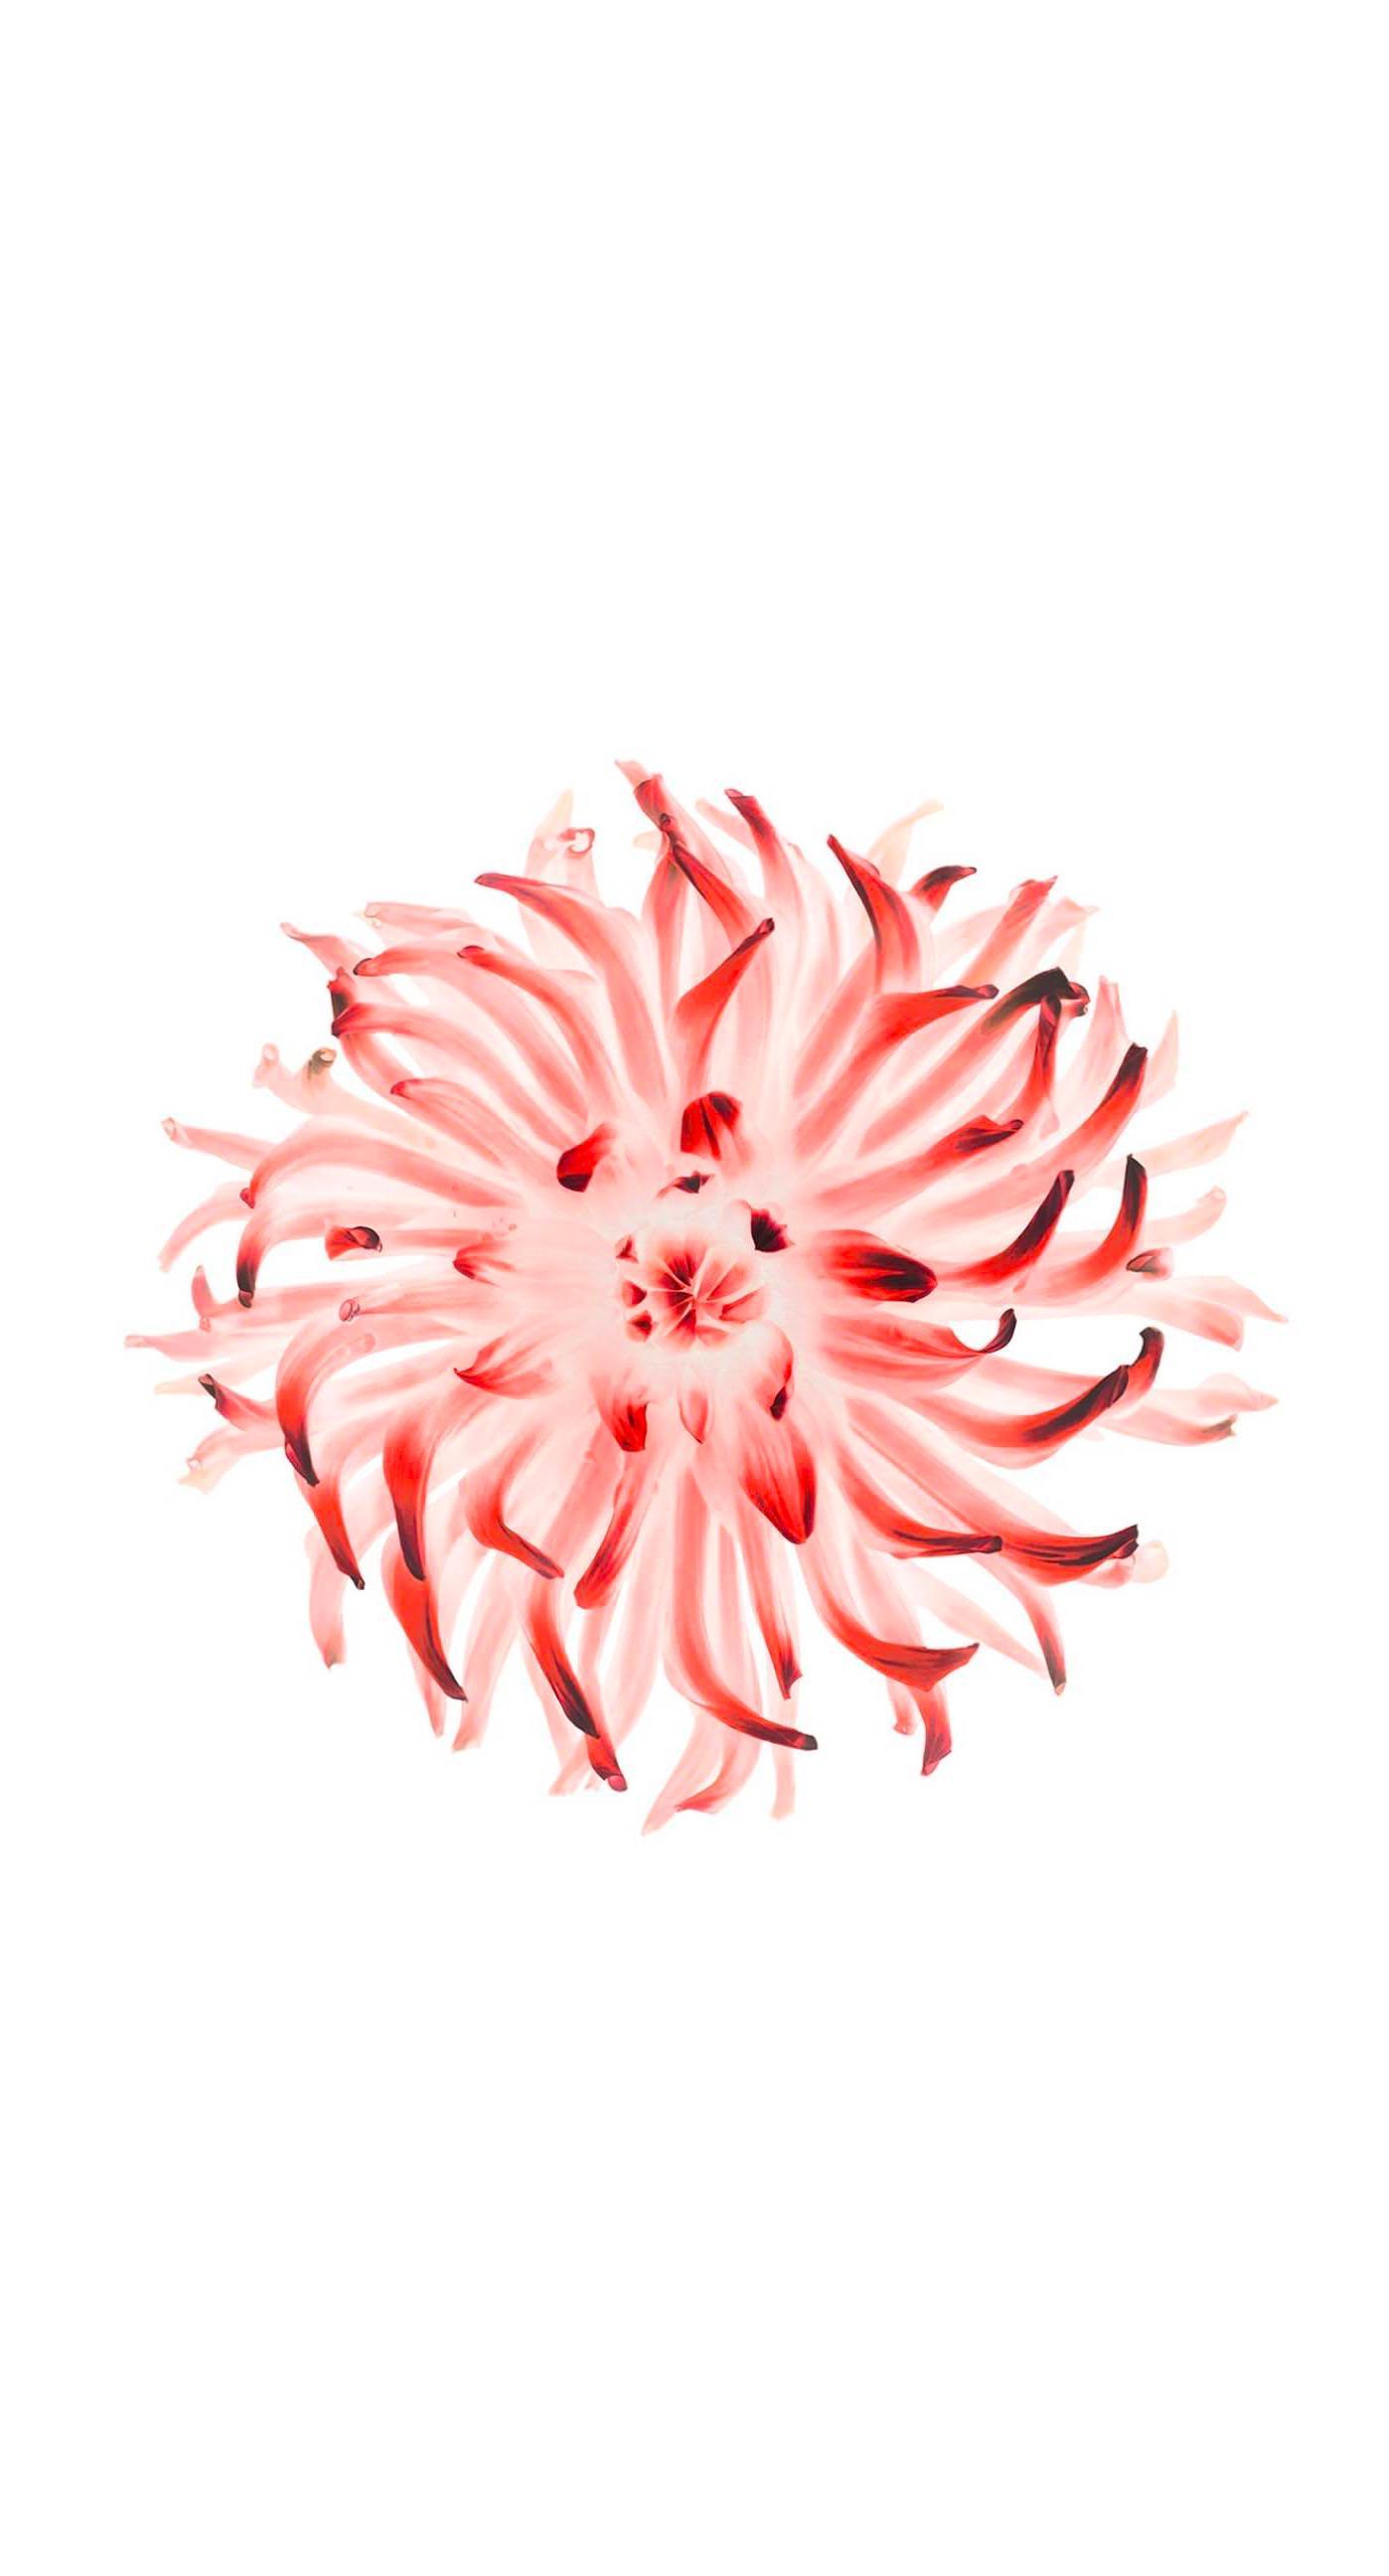 Flower Red White Wallpaper Sc Iphone7plus